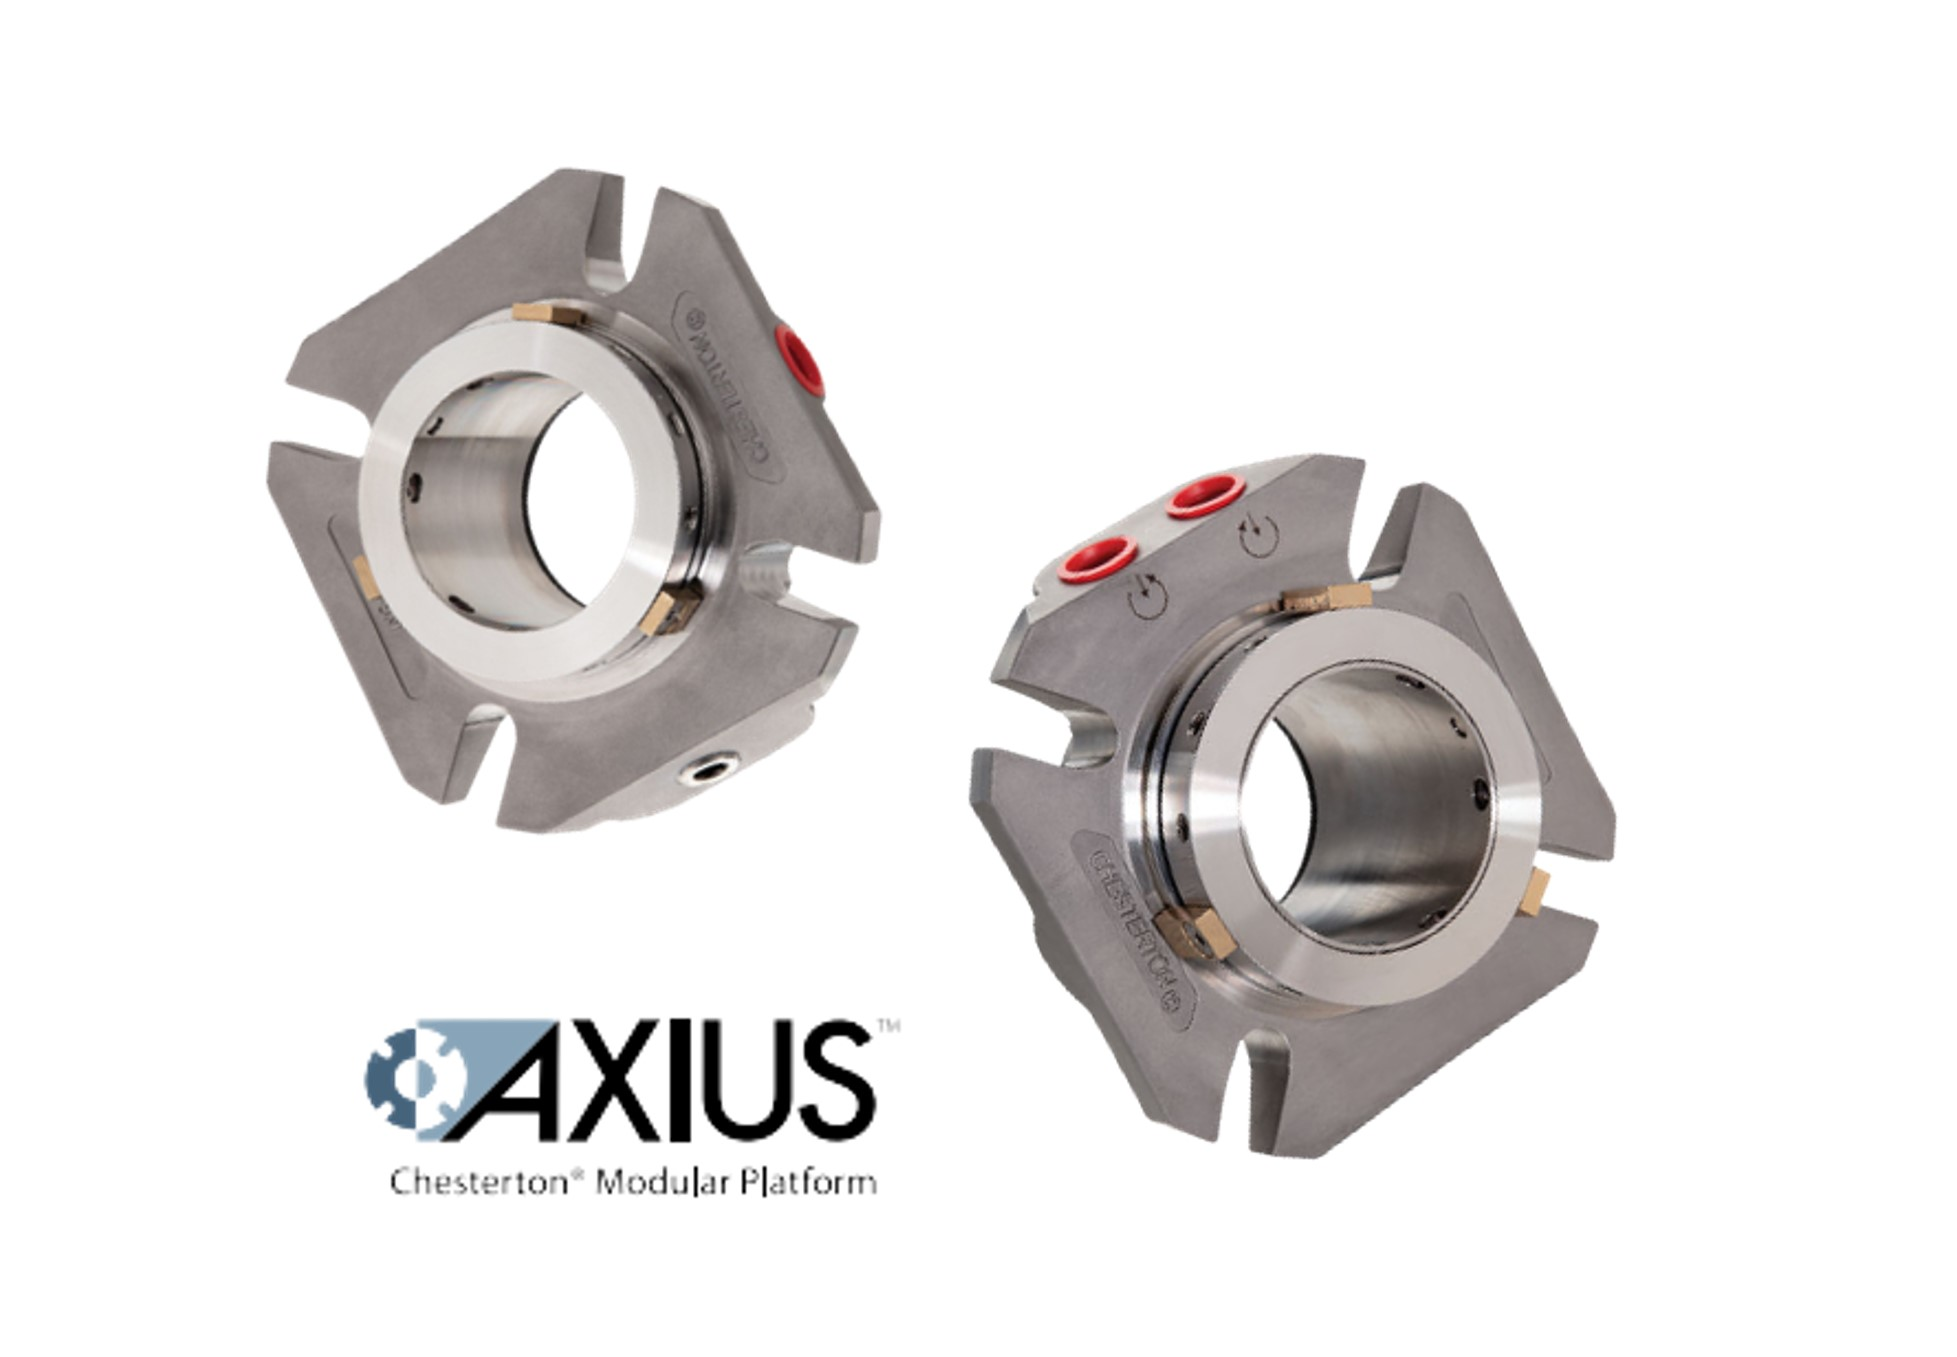 1810 and 2810 Heavy-duty modular cartridge seals